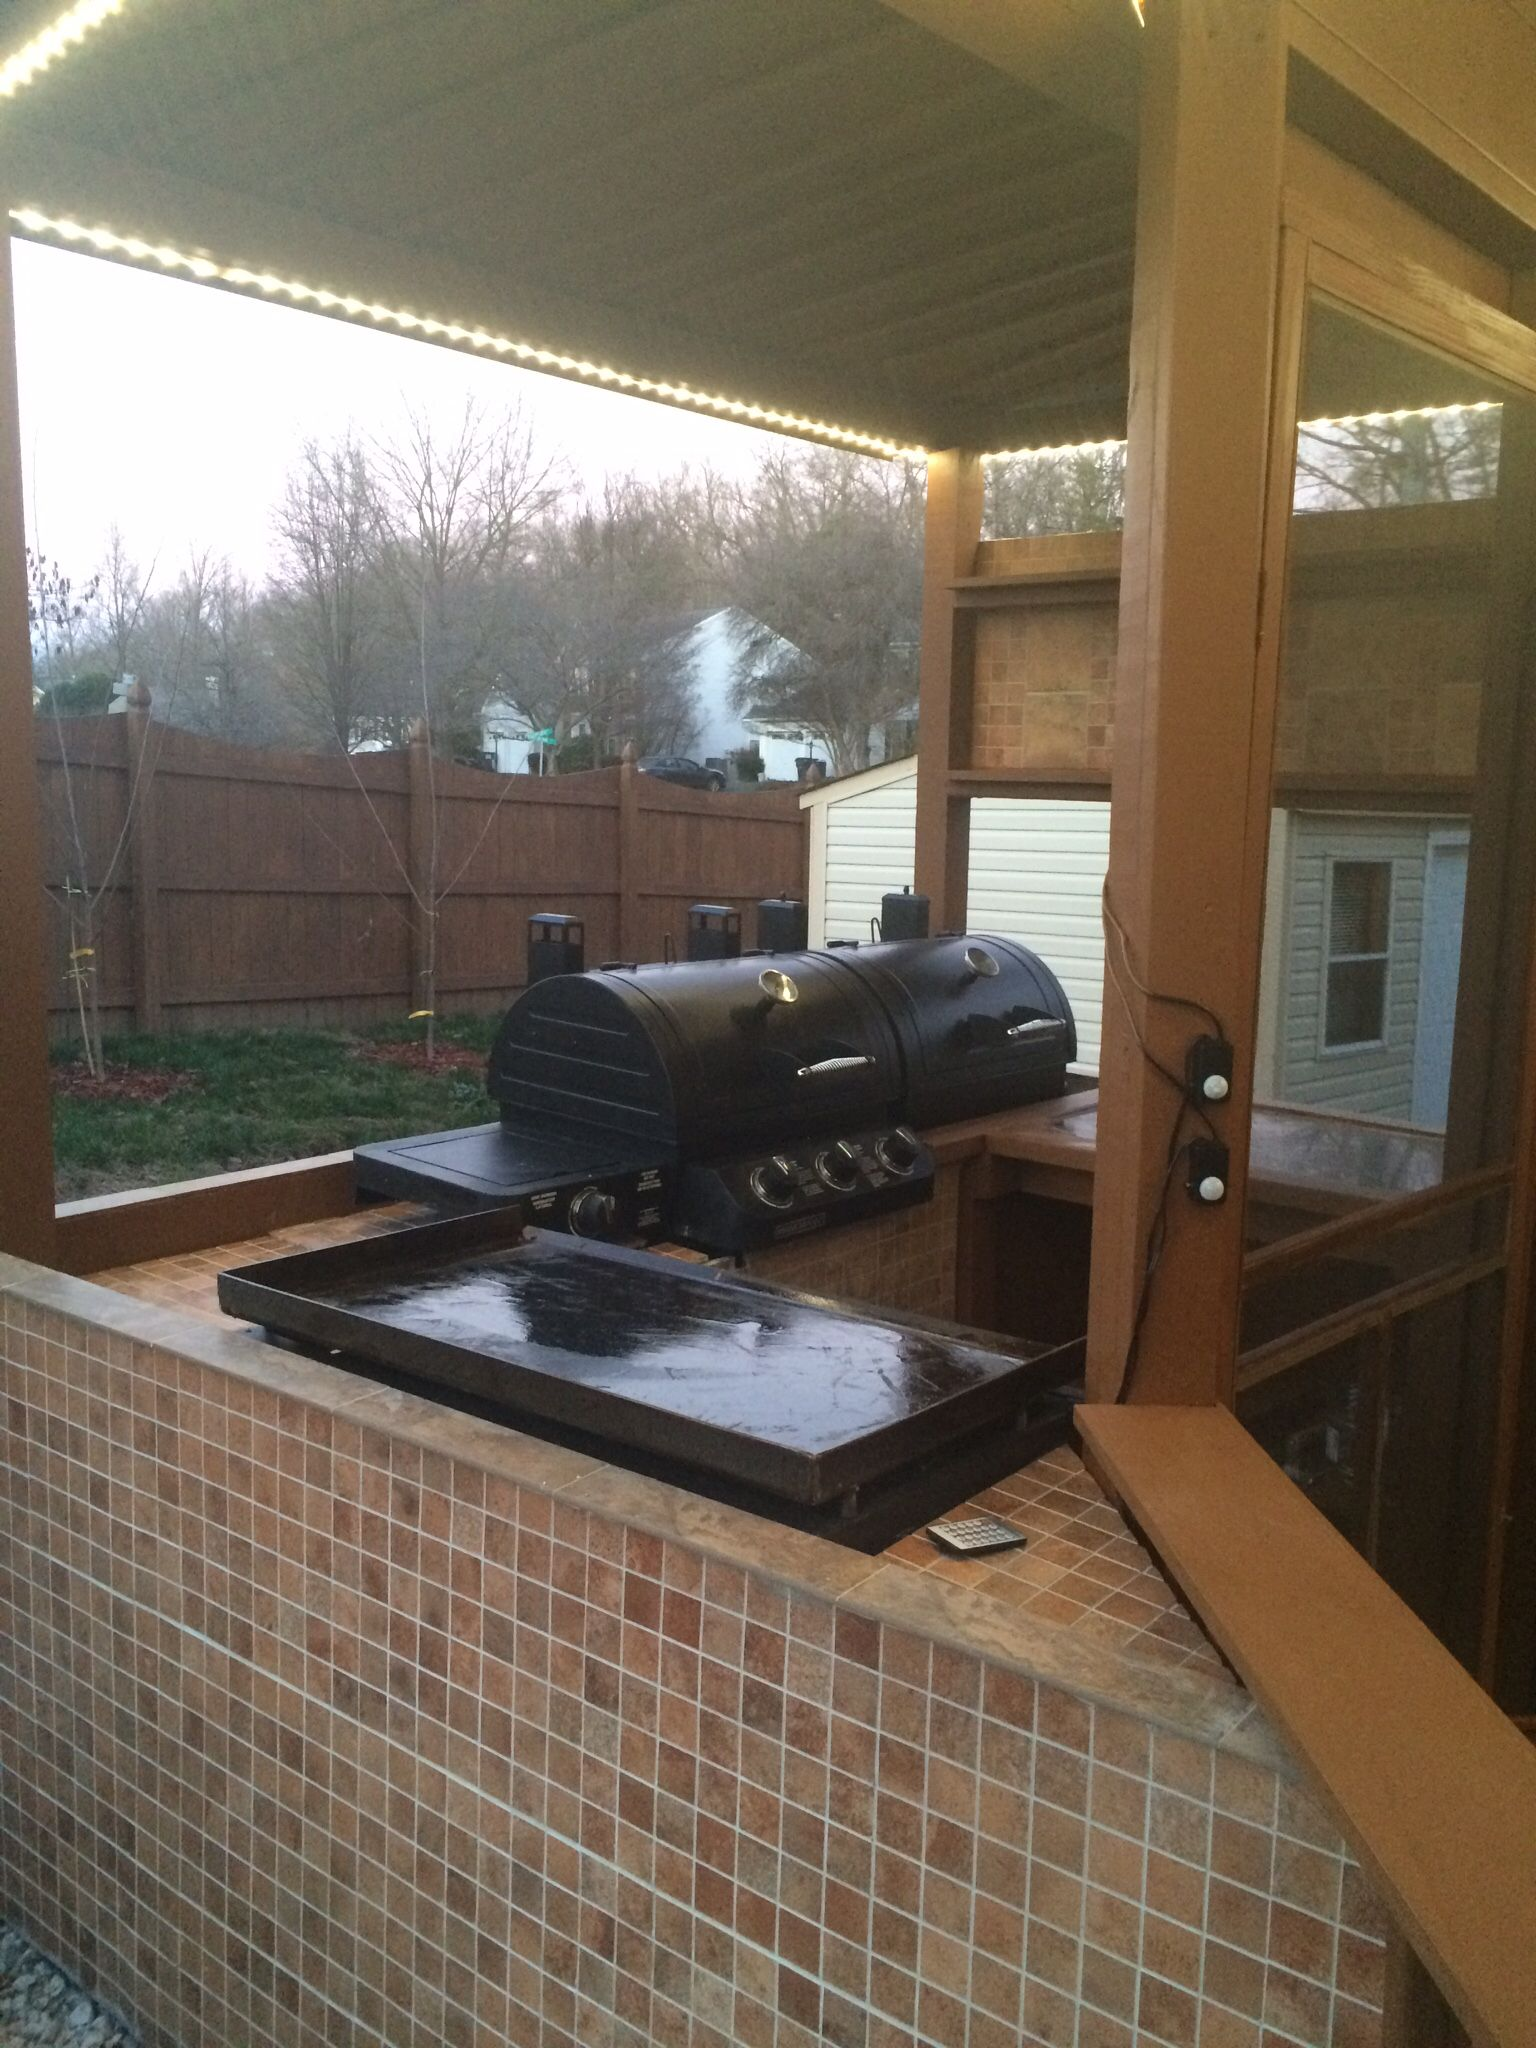 Backyard hibachi grill Luxury outdoor kitchen, Outdoor